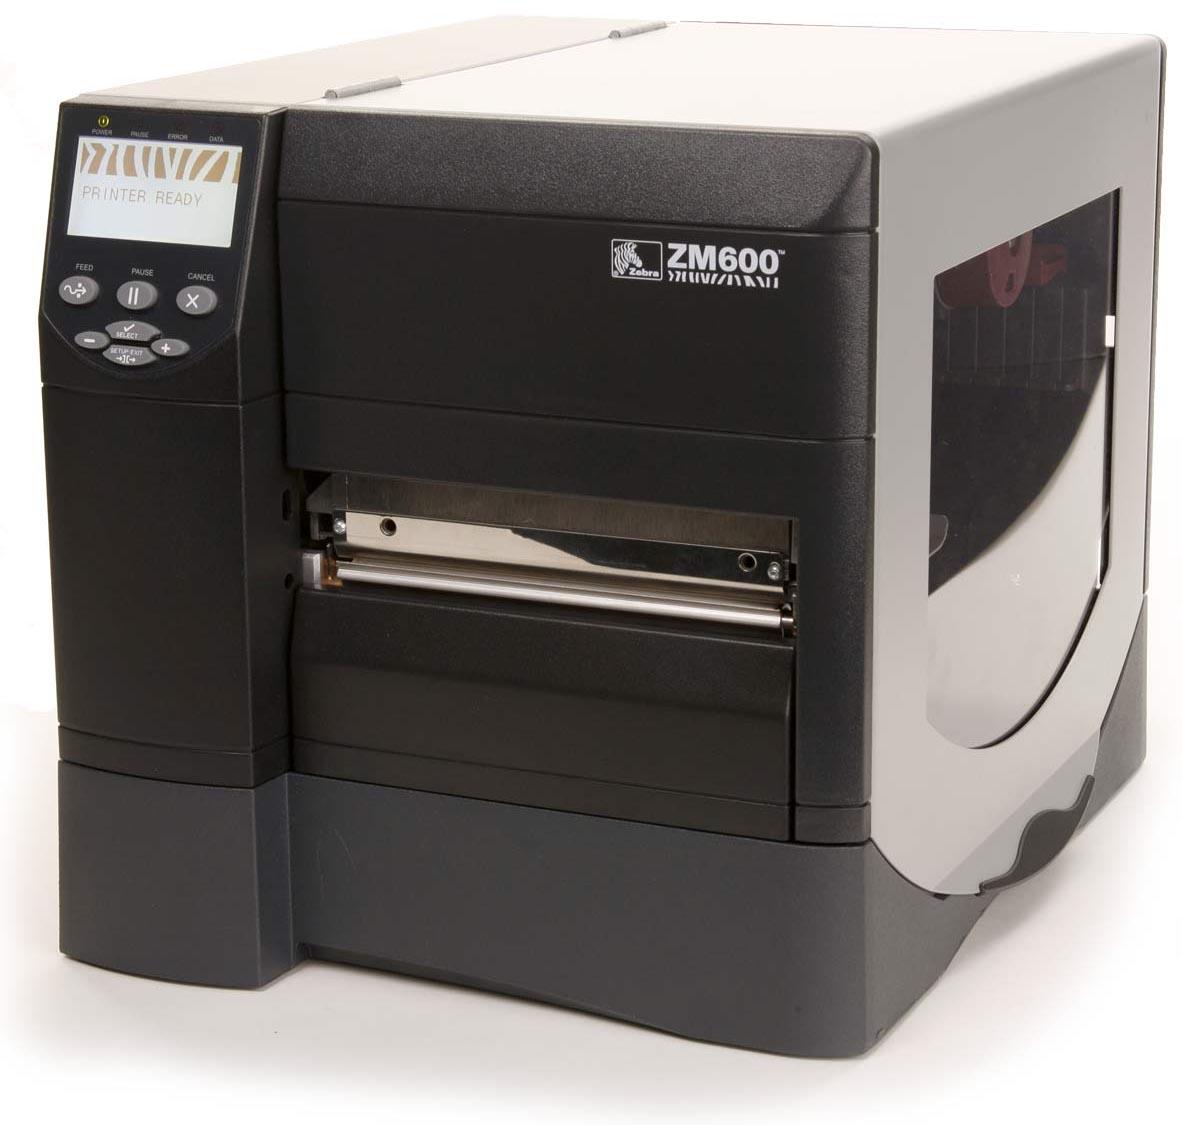 Термотрансферный принтер Zebra ZM600-200E-5000T